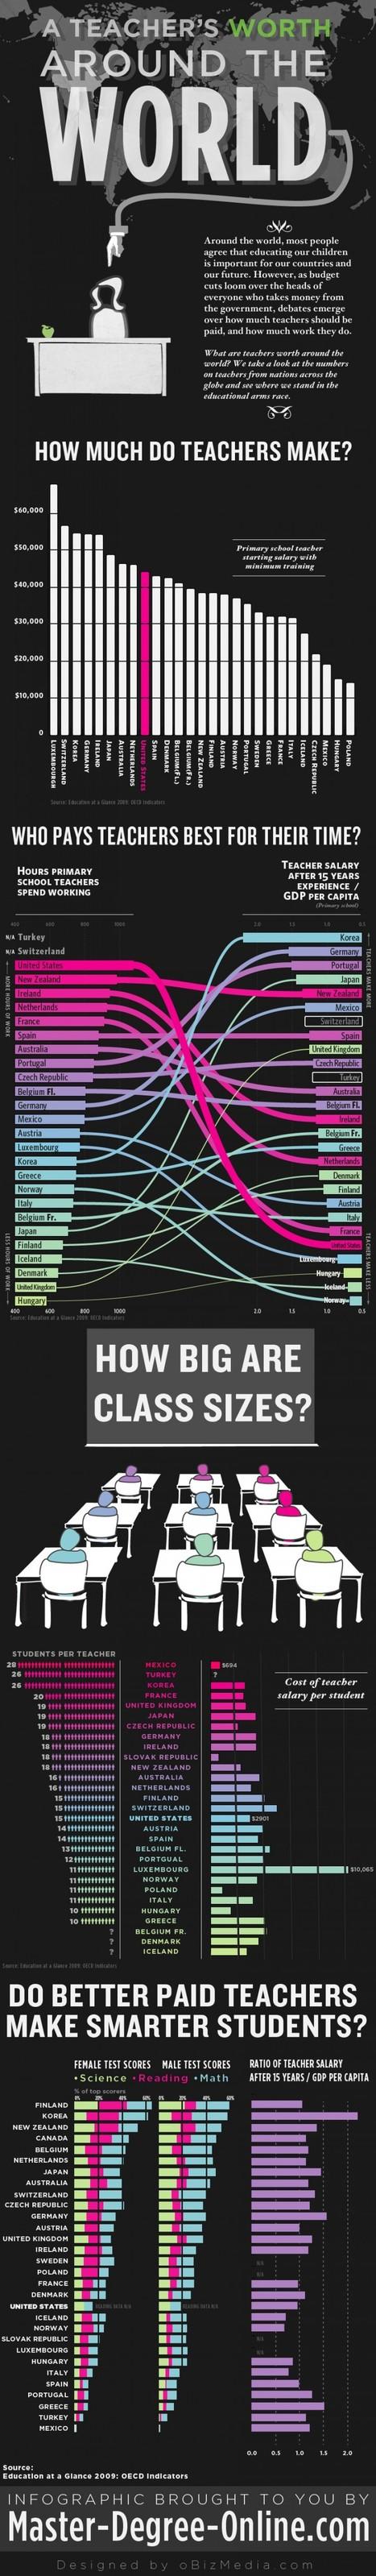 Infographic: A Teacher's Worth Around the World - What Salary Do Teachers Make? | Teaching Around the World | Scoop.it